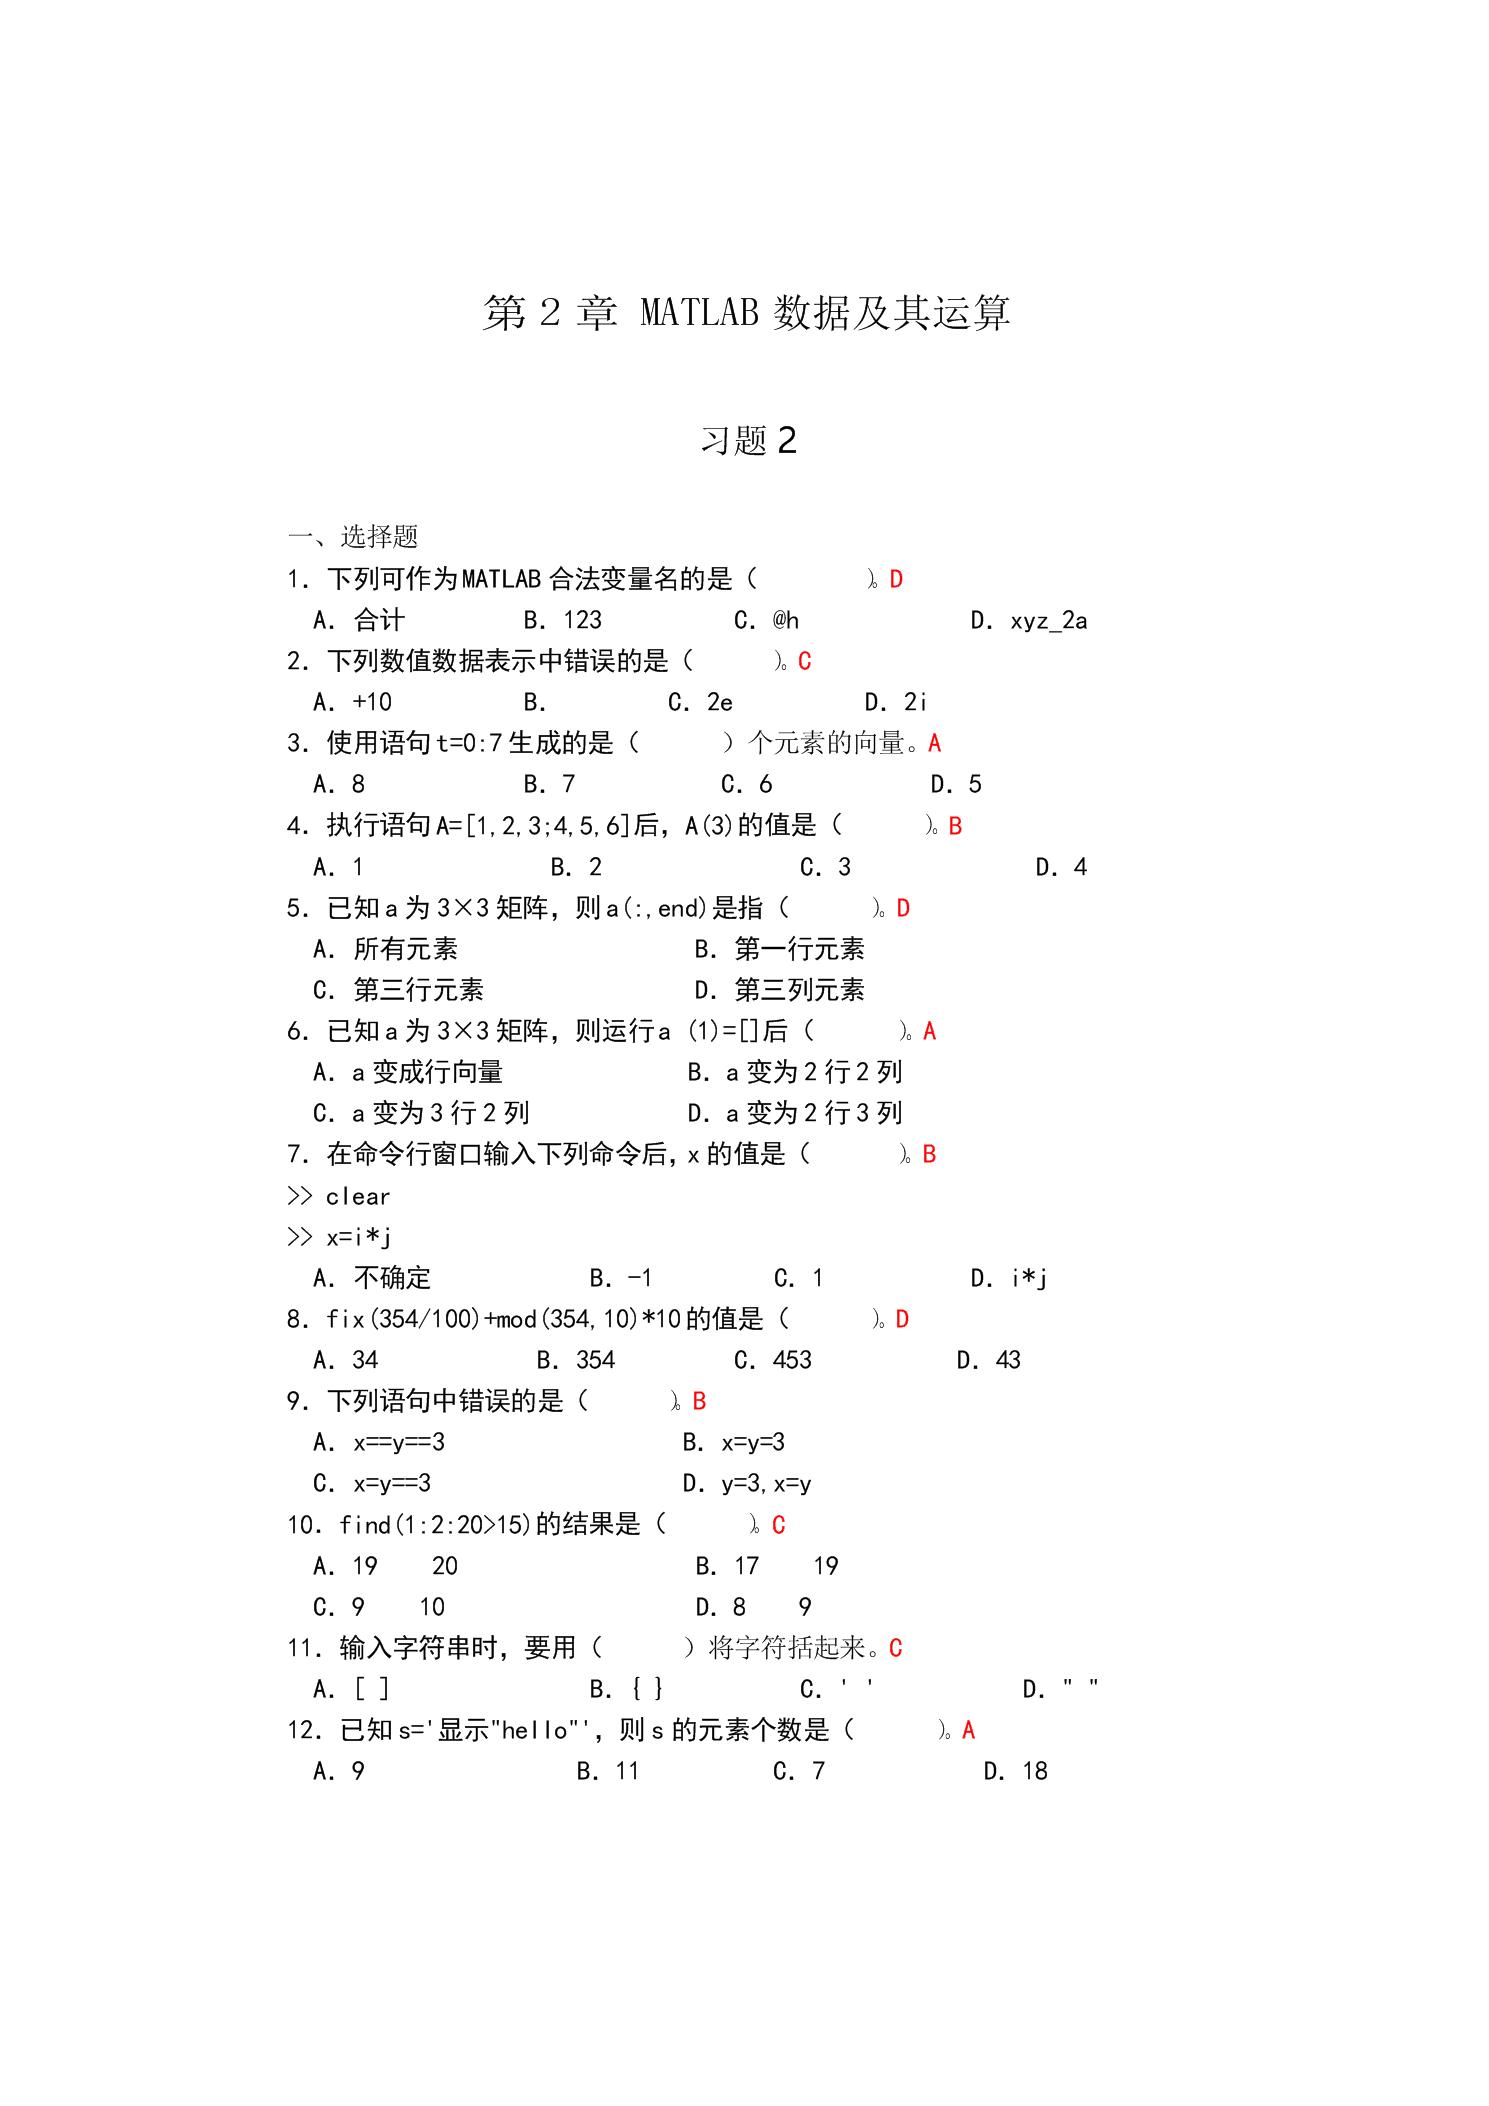 MATLAB数据及其运算_习题答案.docx